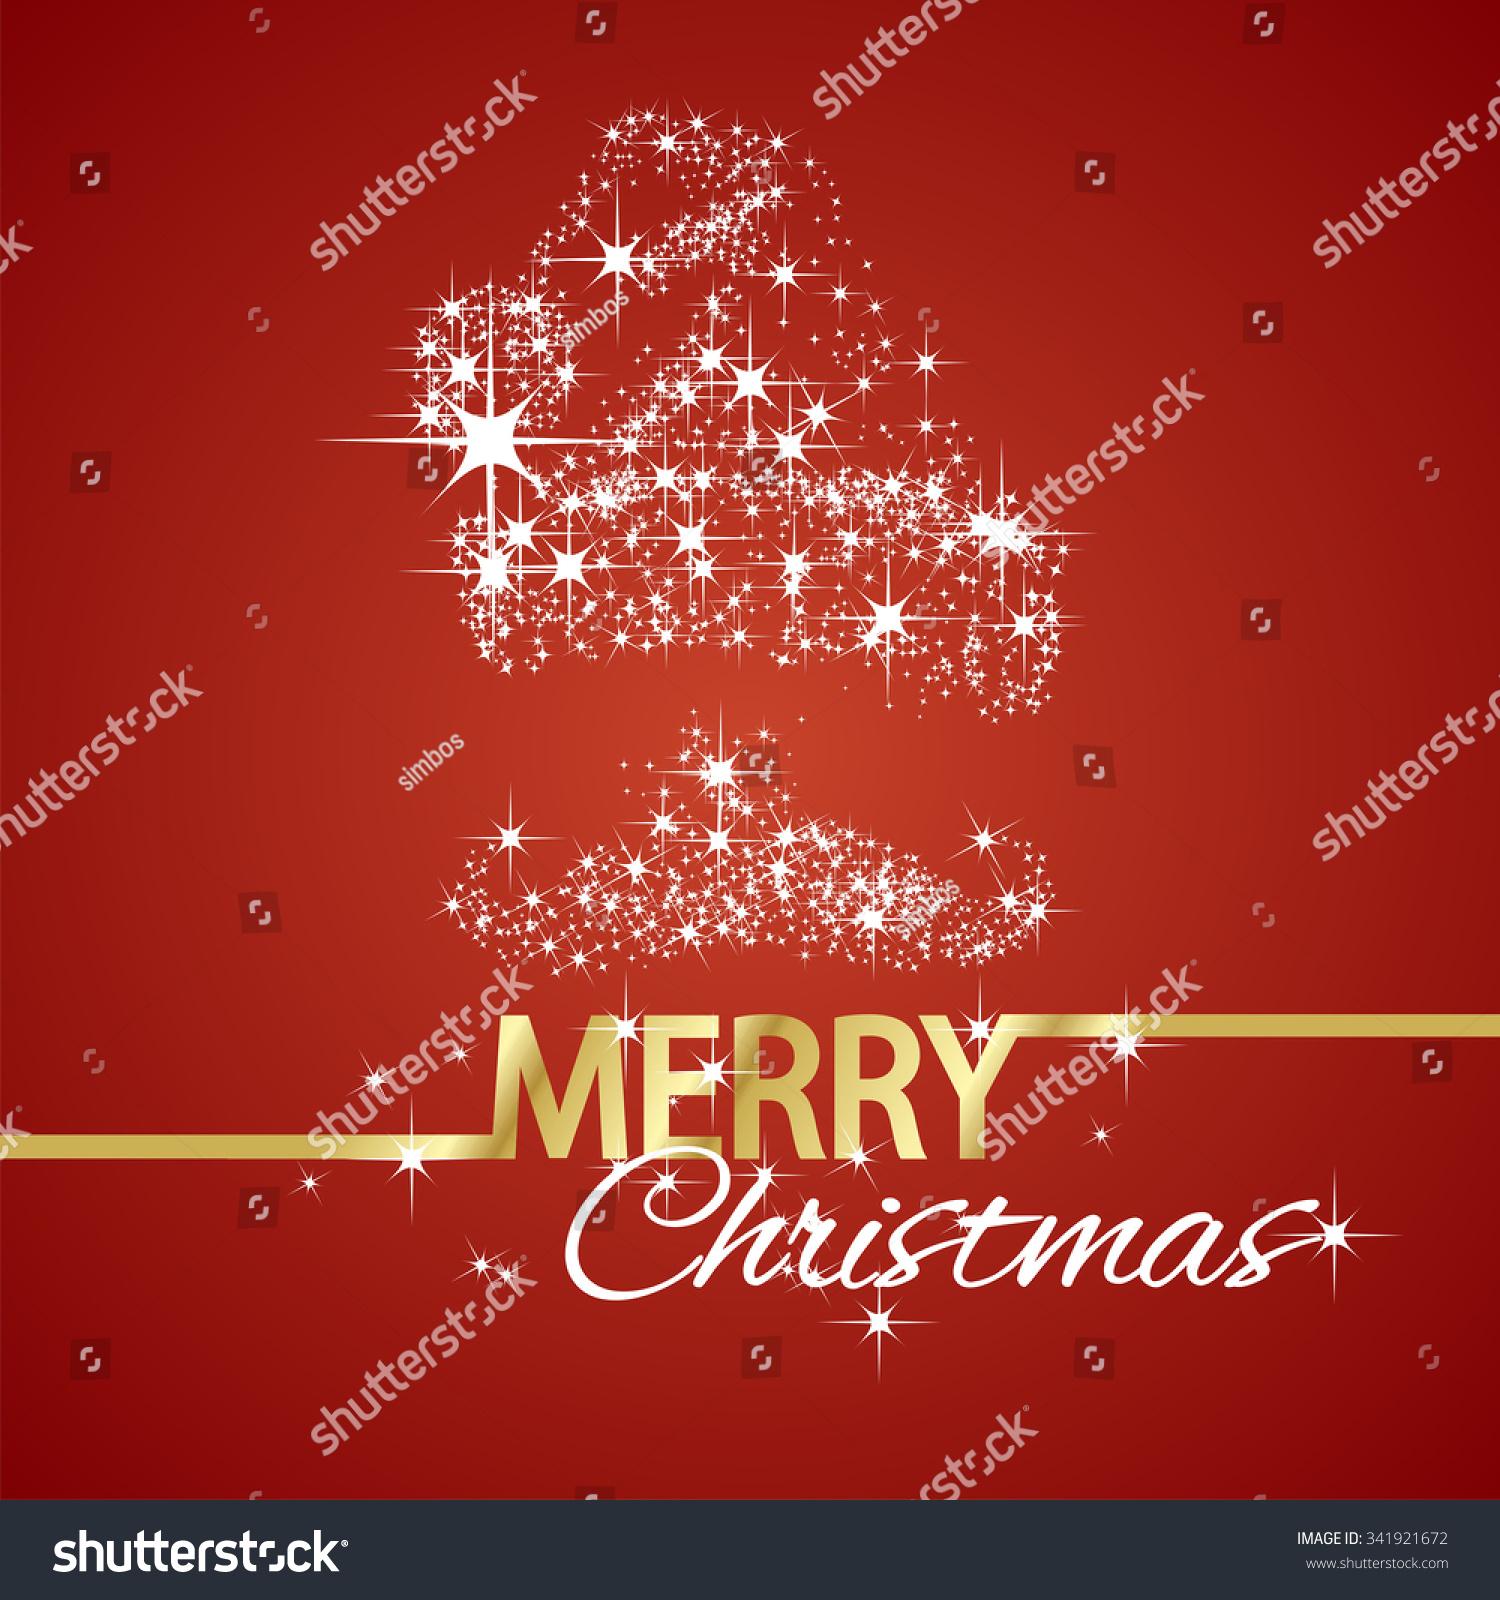 Santa claus symbol stars red background stock vector